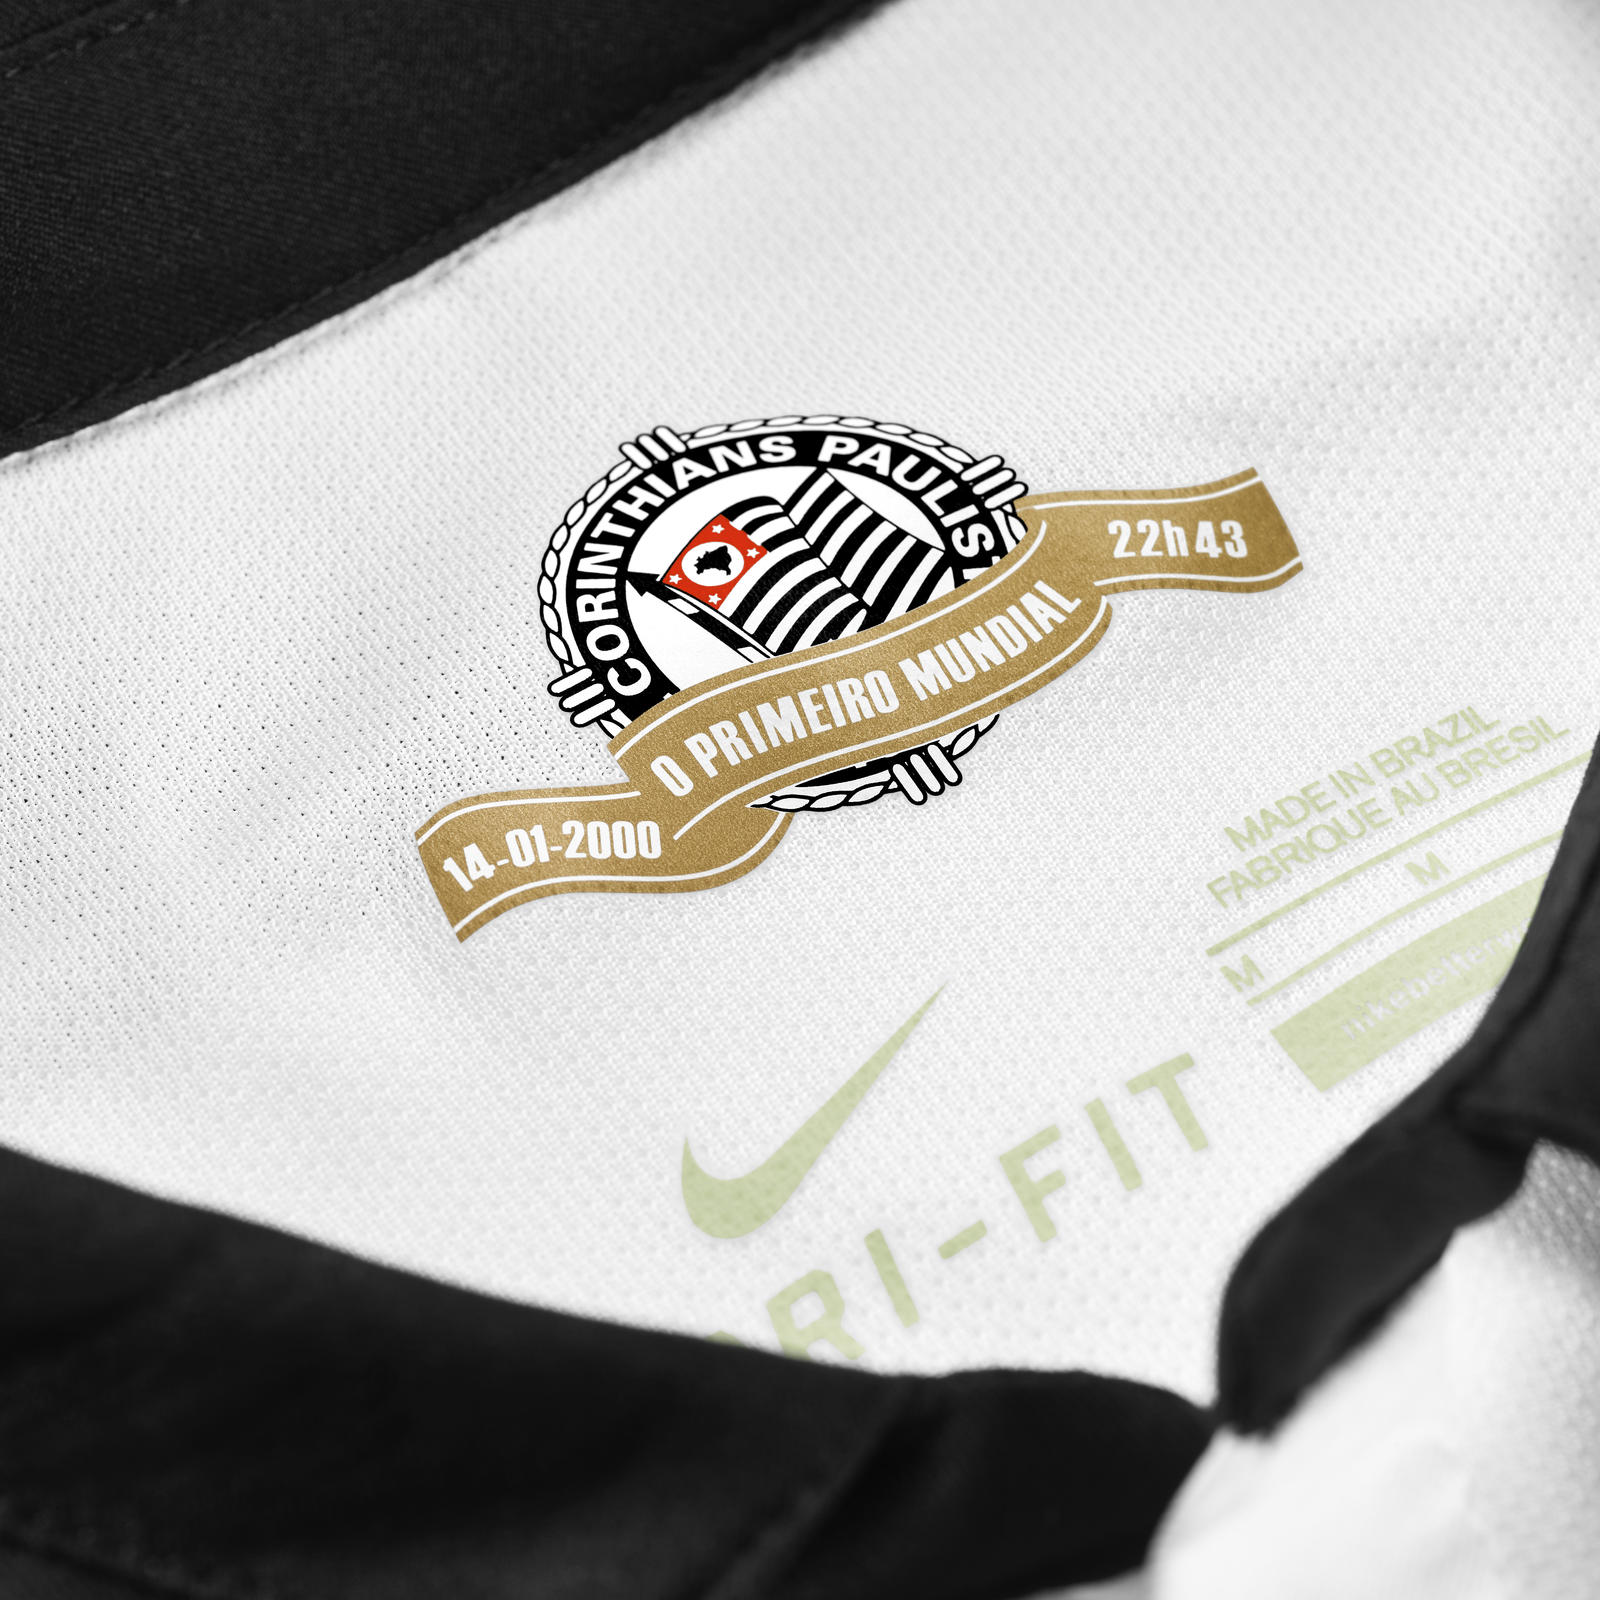 FY15_FB_Brasil_Corintihians_Home_Collar_1954